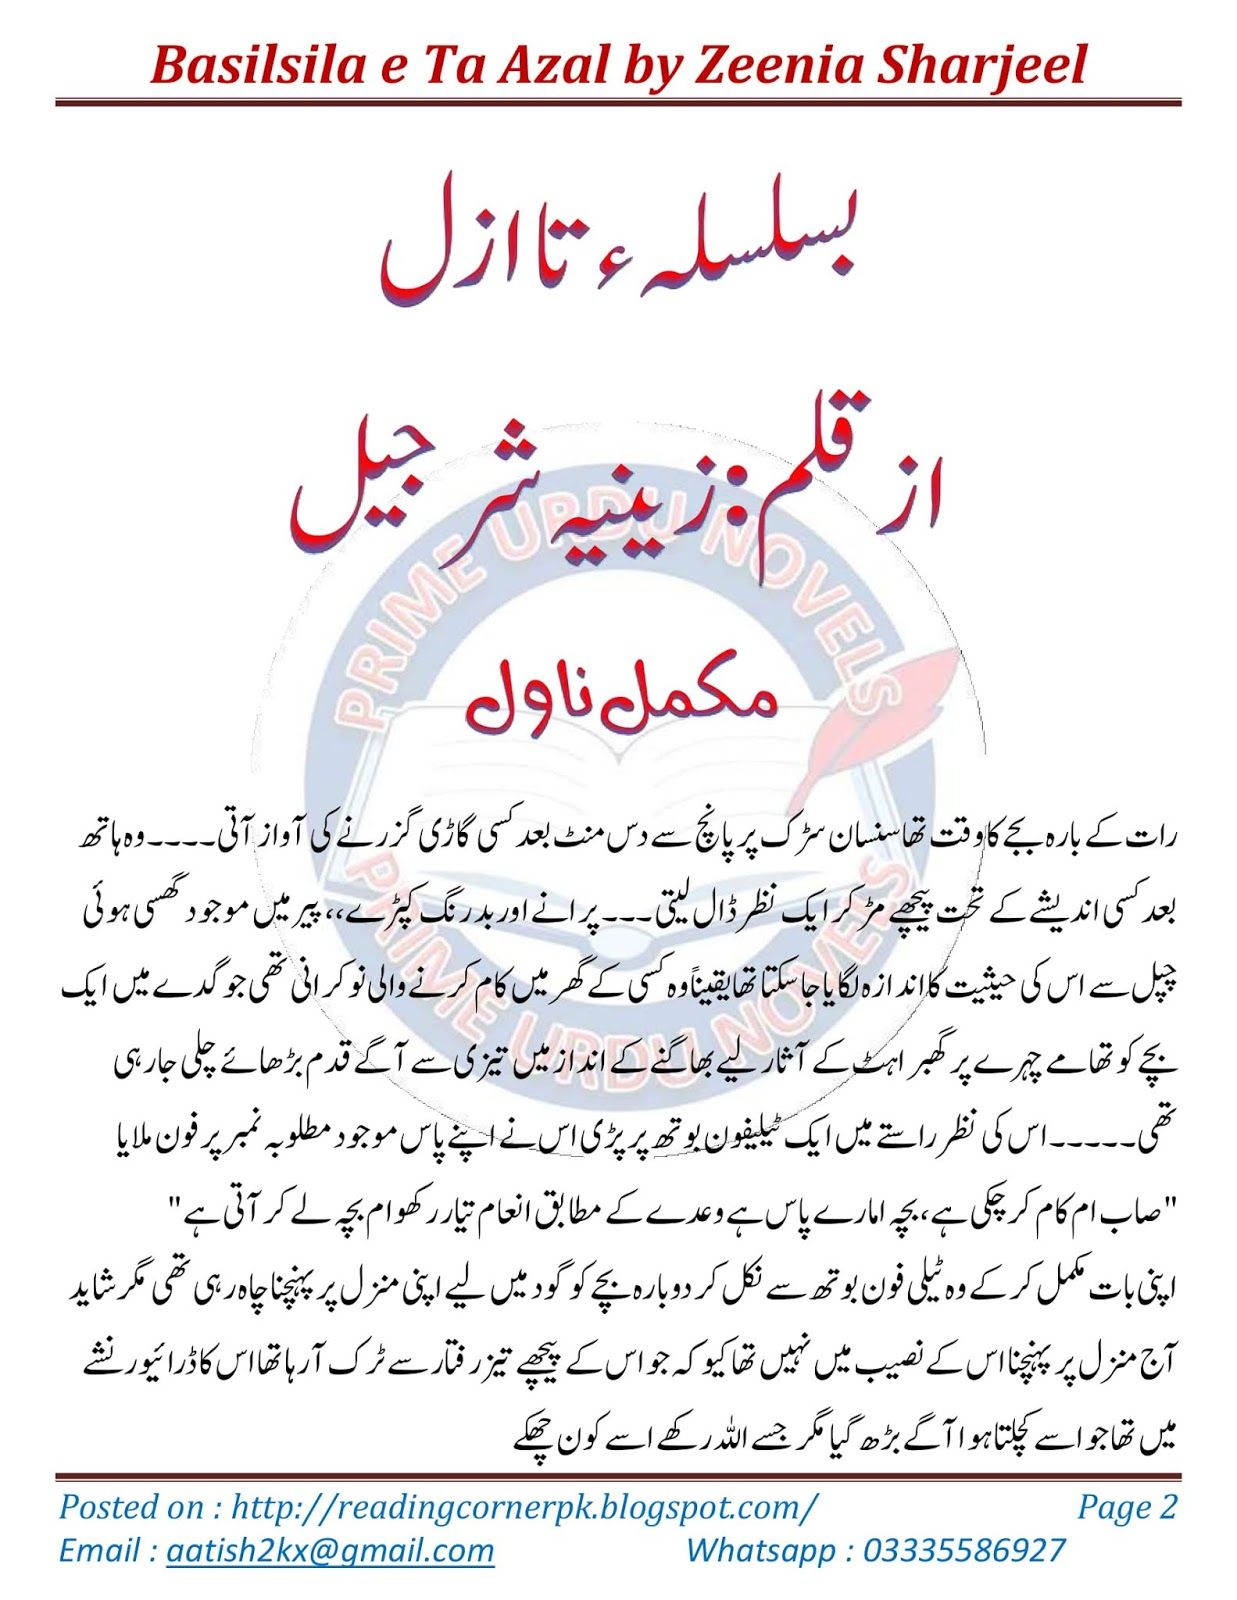 Basilsila E Ta Azal By Zeenia Sharjeel Complete Rude Cruel Hero Novel